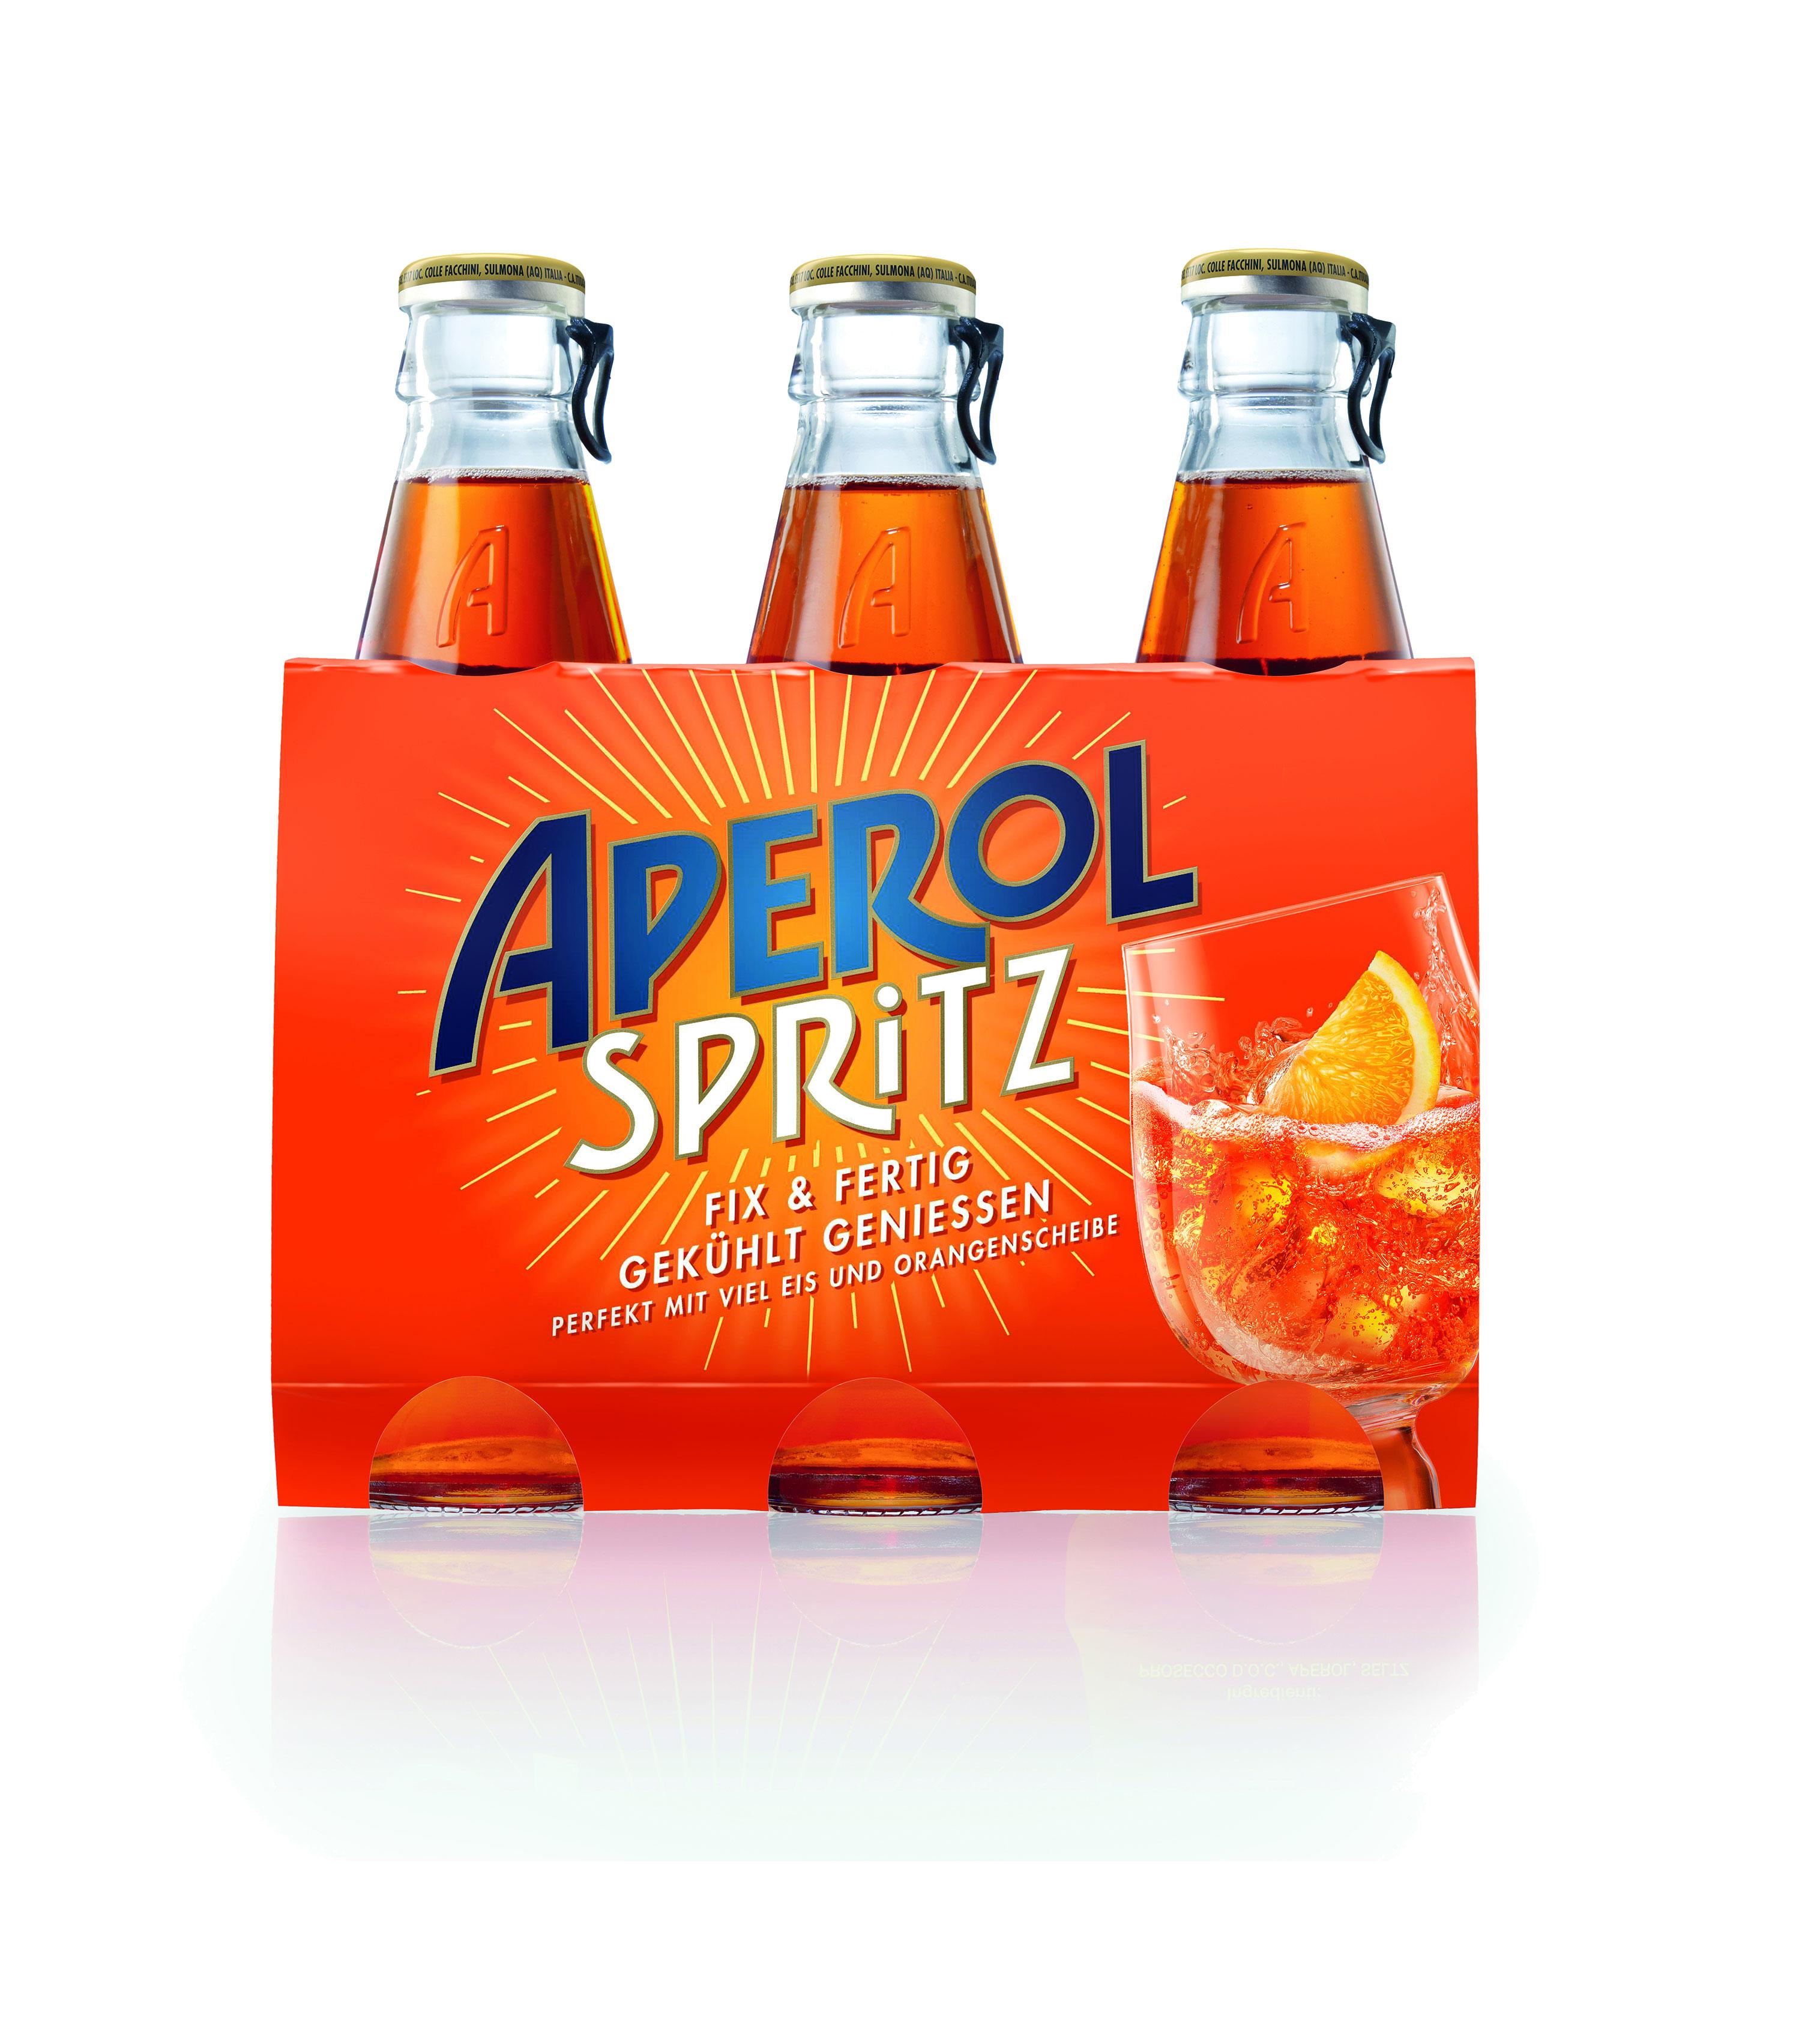 Aperol Spritz 3x 17,5cl (10,5% Vol) ready to drink Aperitivo / Aperitif - [Enthält Sulfite]